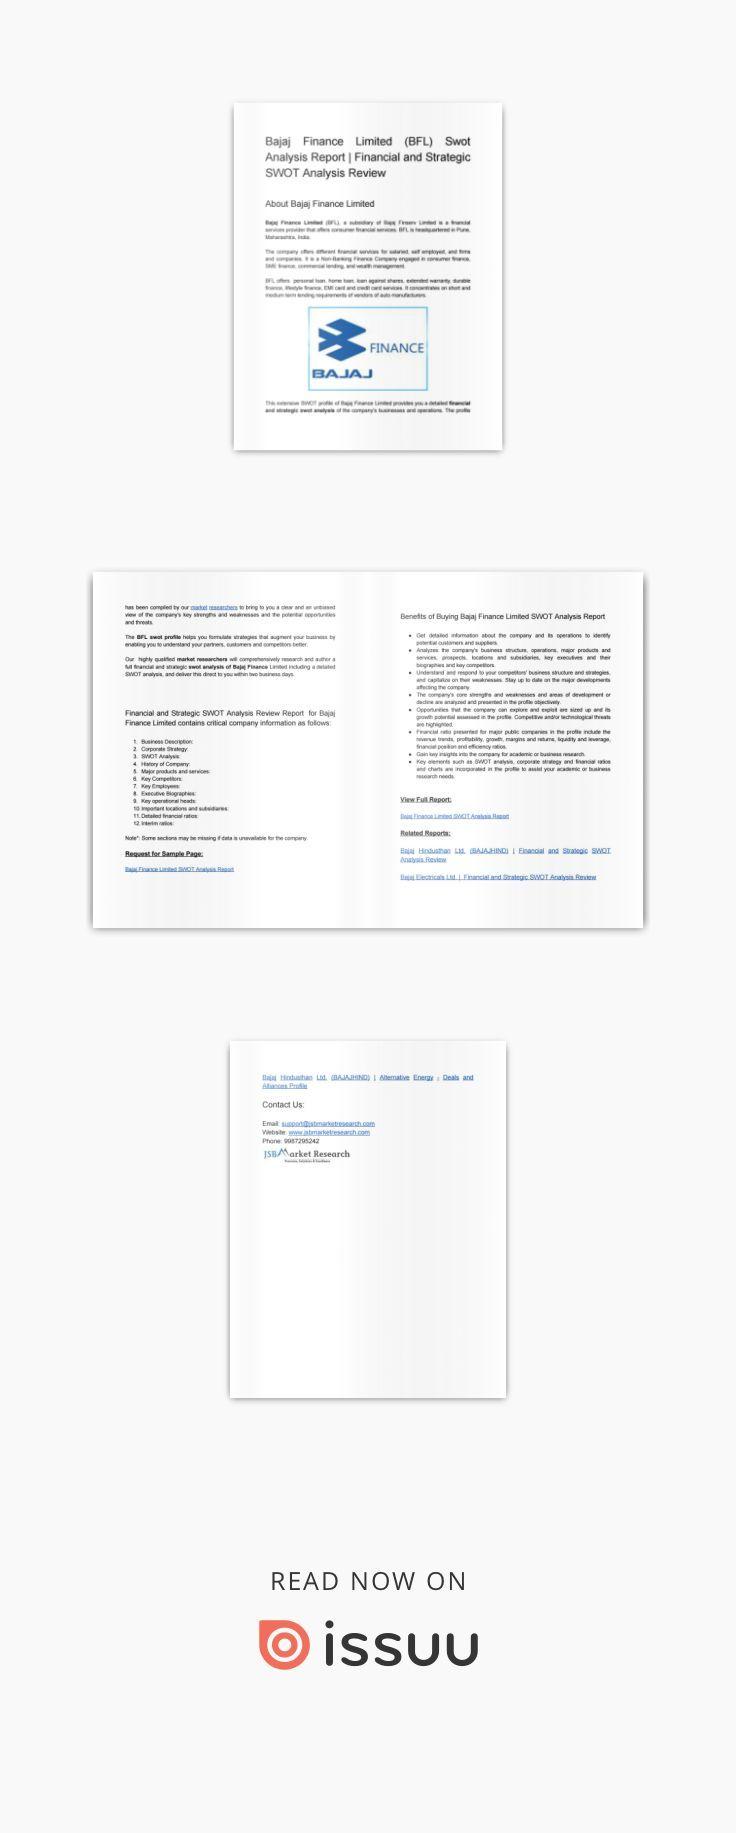 Bajaj Finance Limited Bfl Swot Analysis Report Swot Analysis